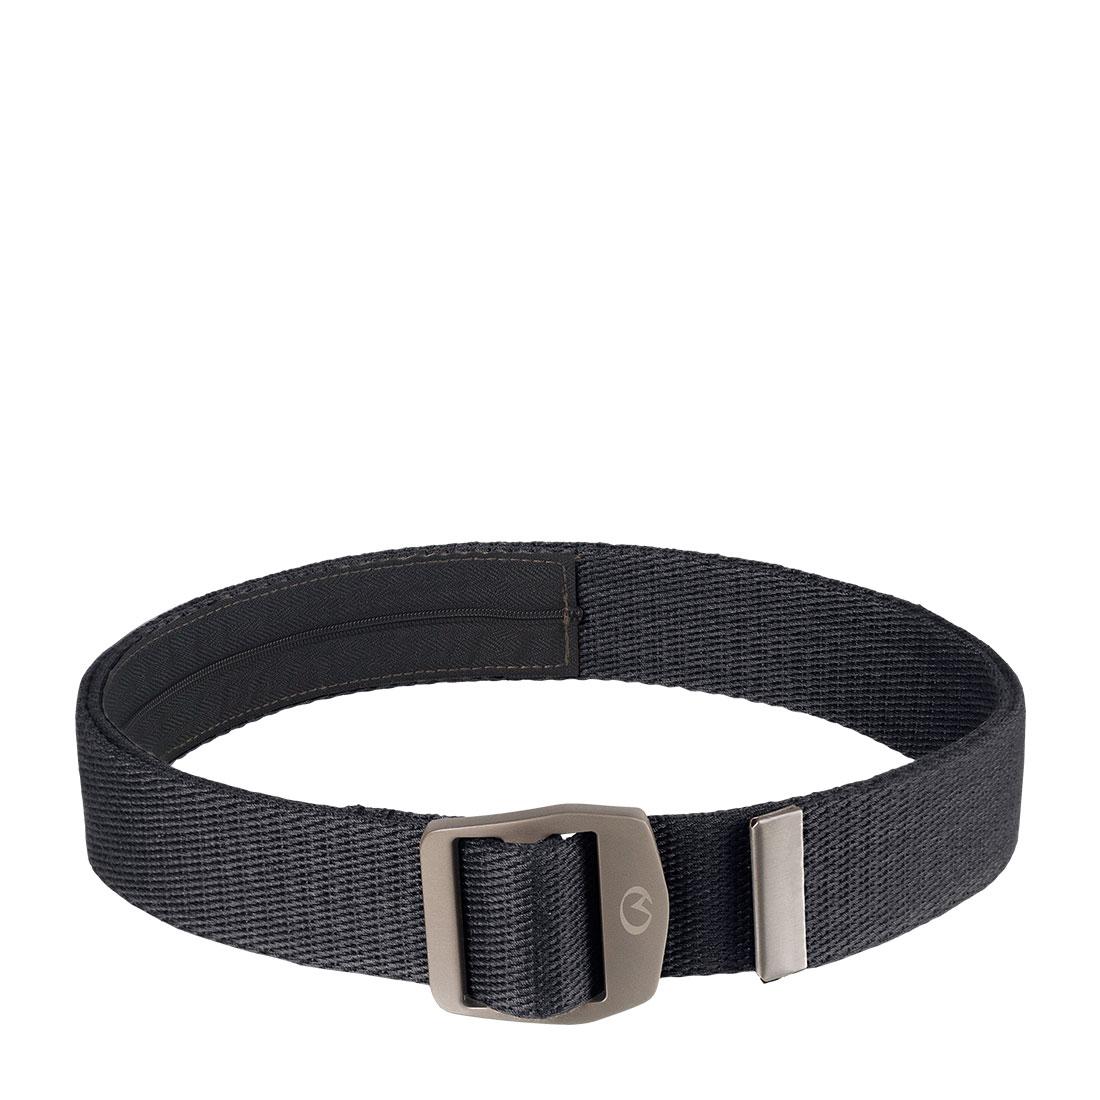 71135_money-belt-black-1